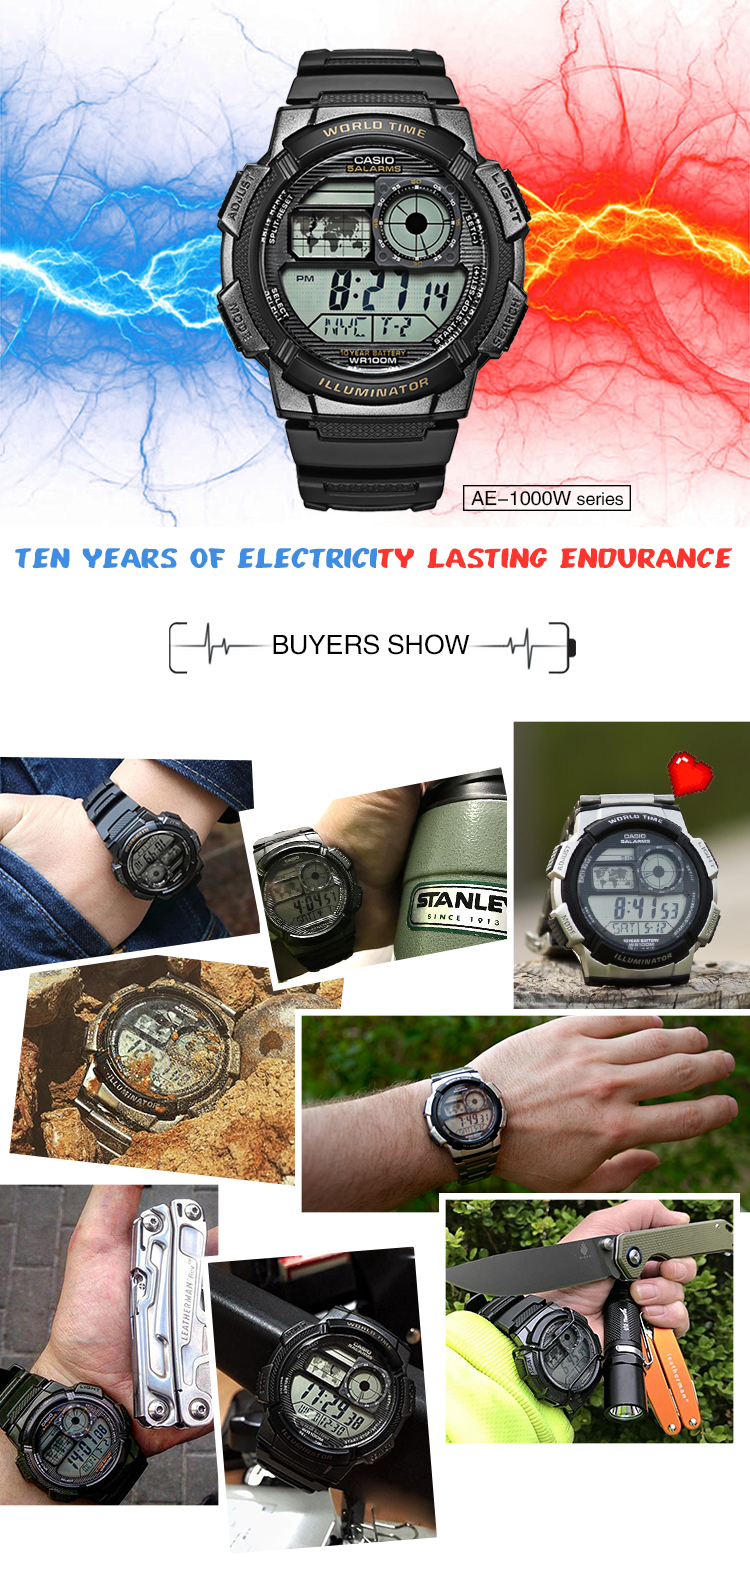 Casio Watch Analogue Mens Quartz Sports Resin Strap Student World Time Ae 1000w 1a Original Xlmodel Photo 0000